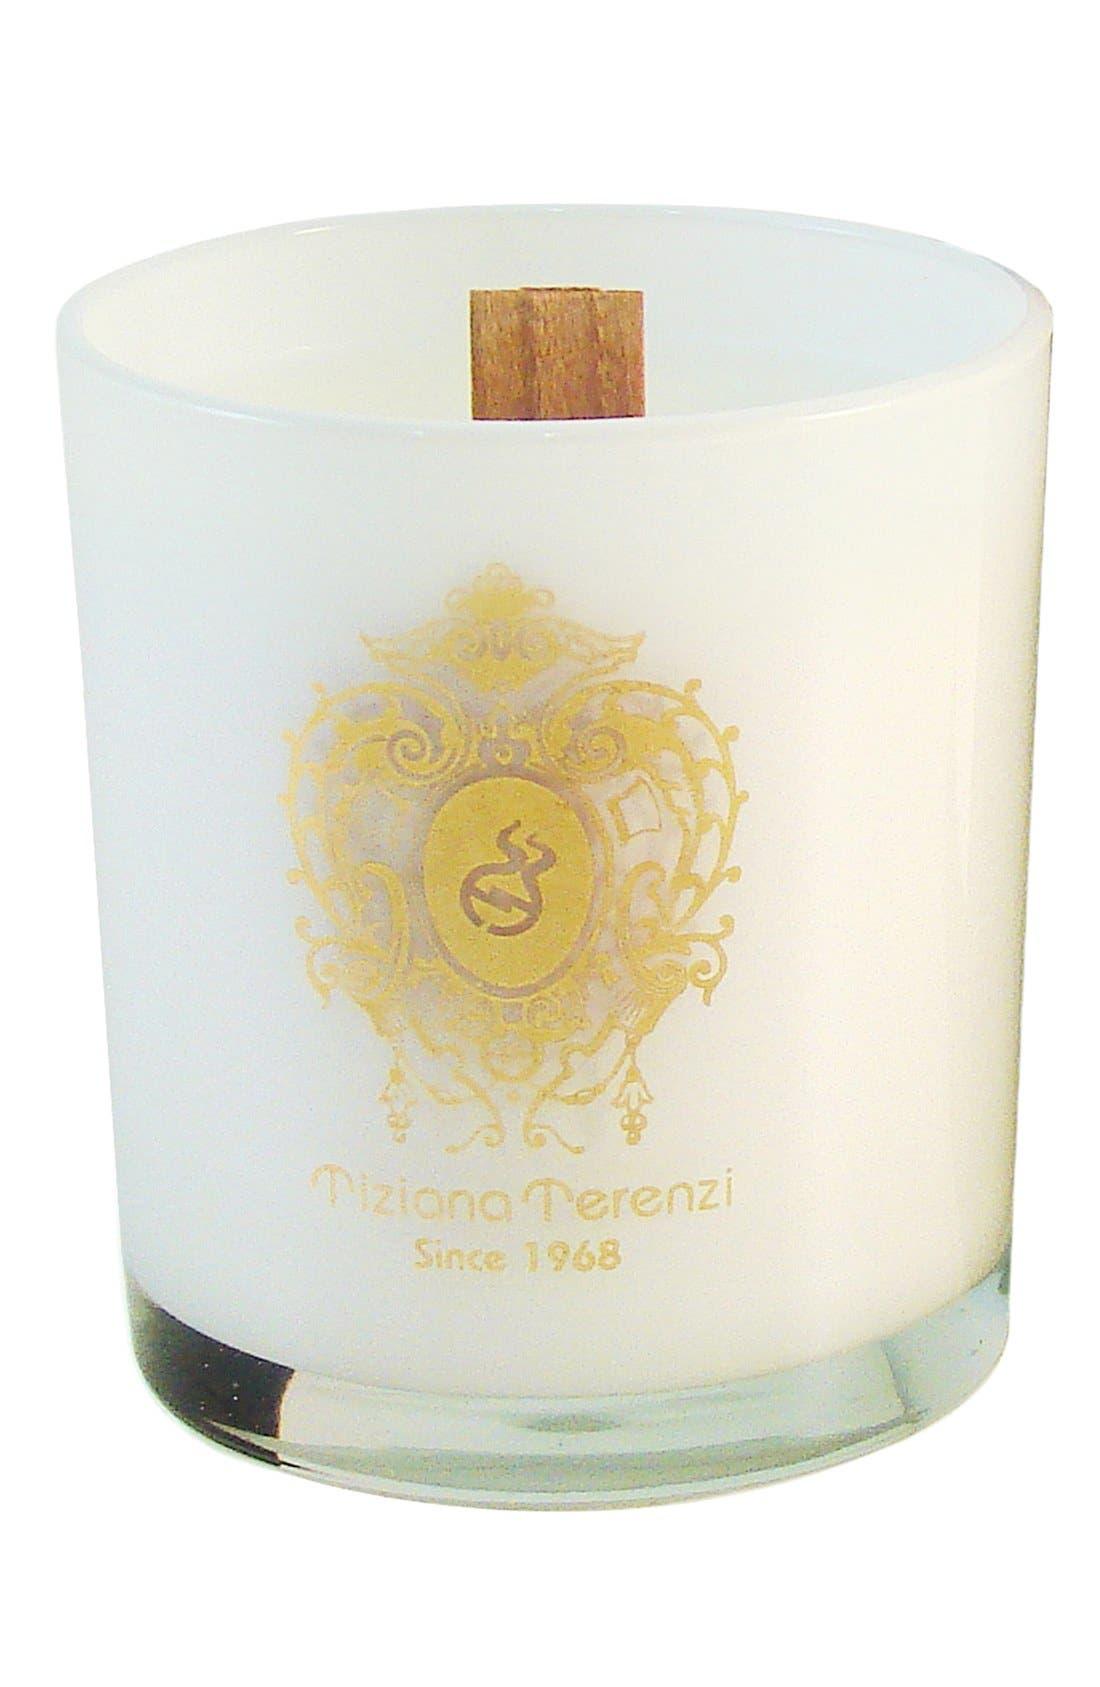 Alternate Image 1 Selected - Tiziana Terenzi 'Ischia Orchid' Single Wick Gioconda Candle